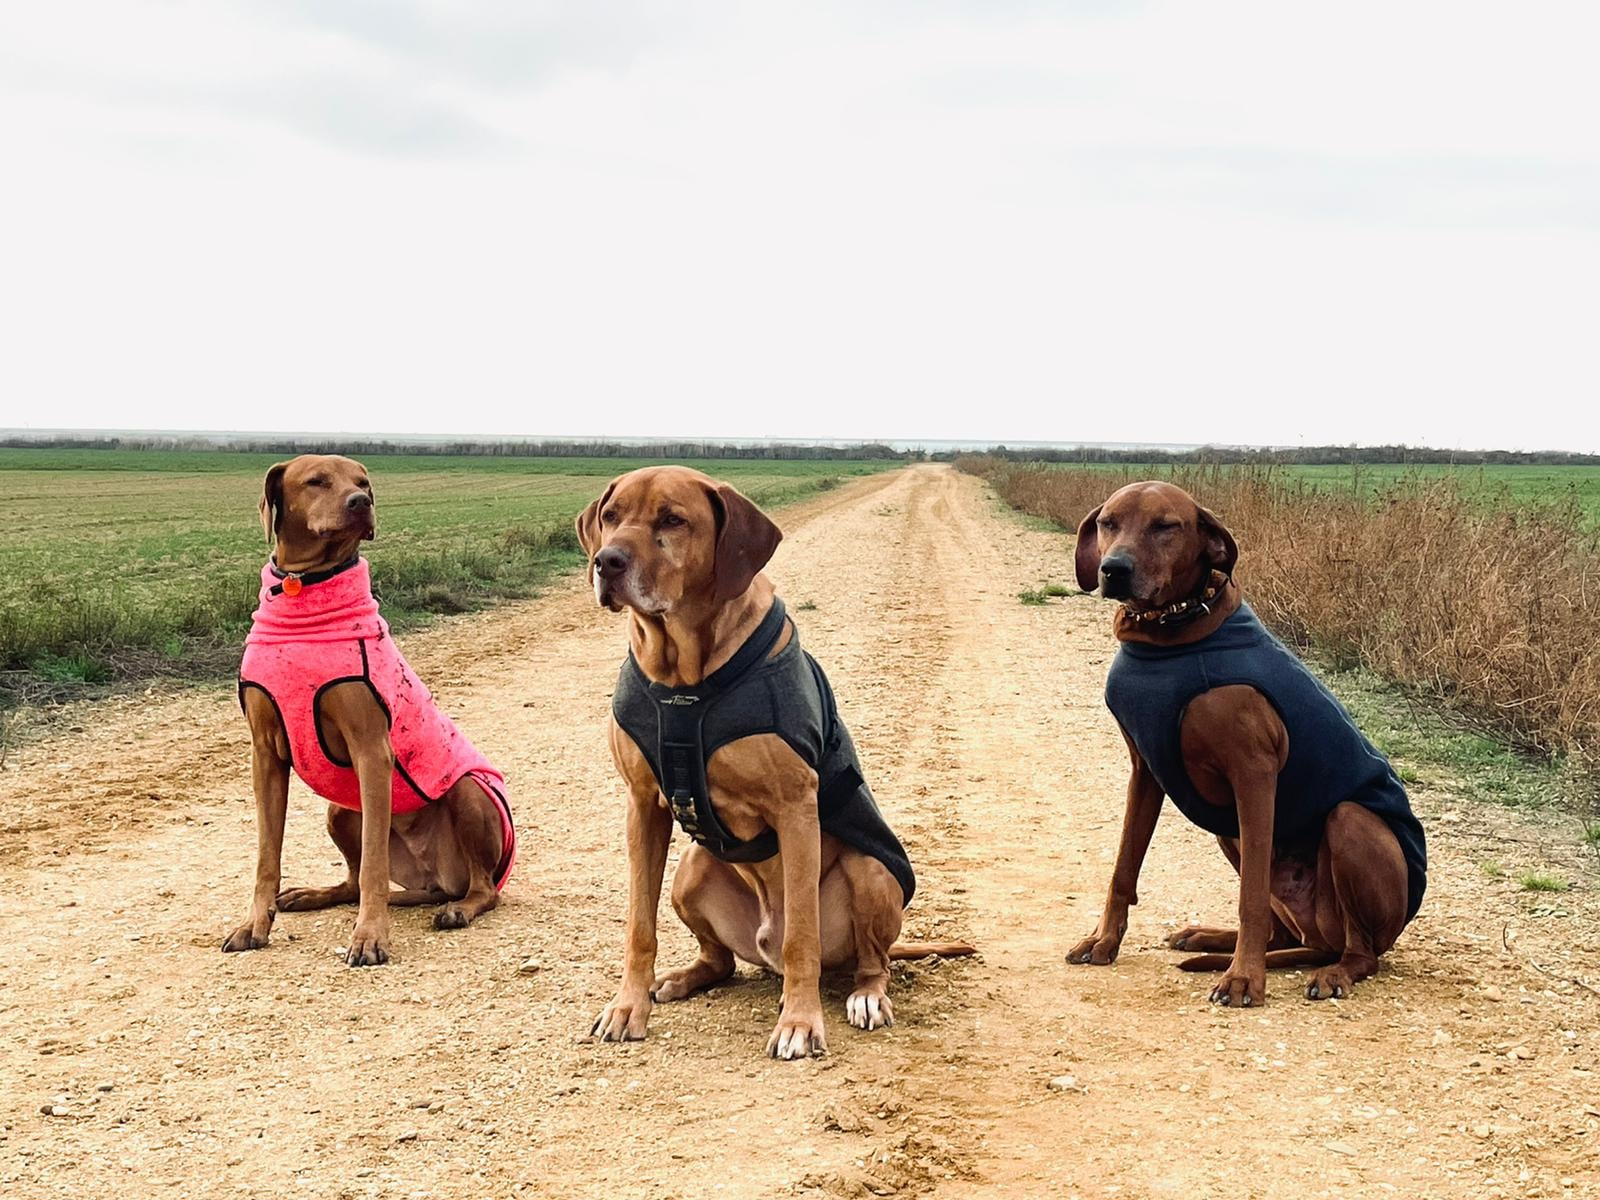 Ridgebacks mit Hundemantel Hundemantel Wirbelsäule Hundephysiotherapie Heidi Schunck Carnivorus Zauberhunde Vivien Wittig